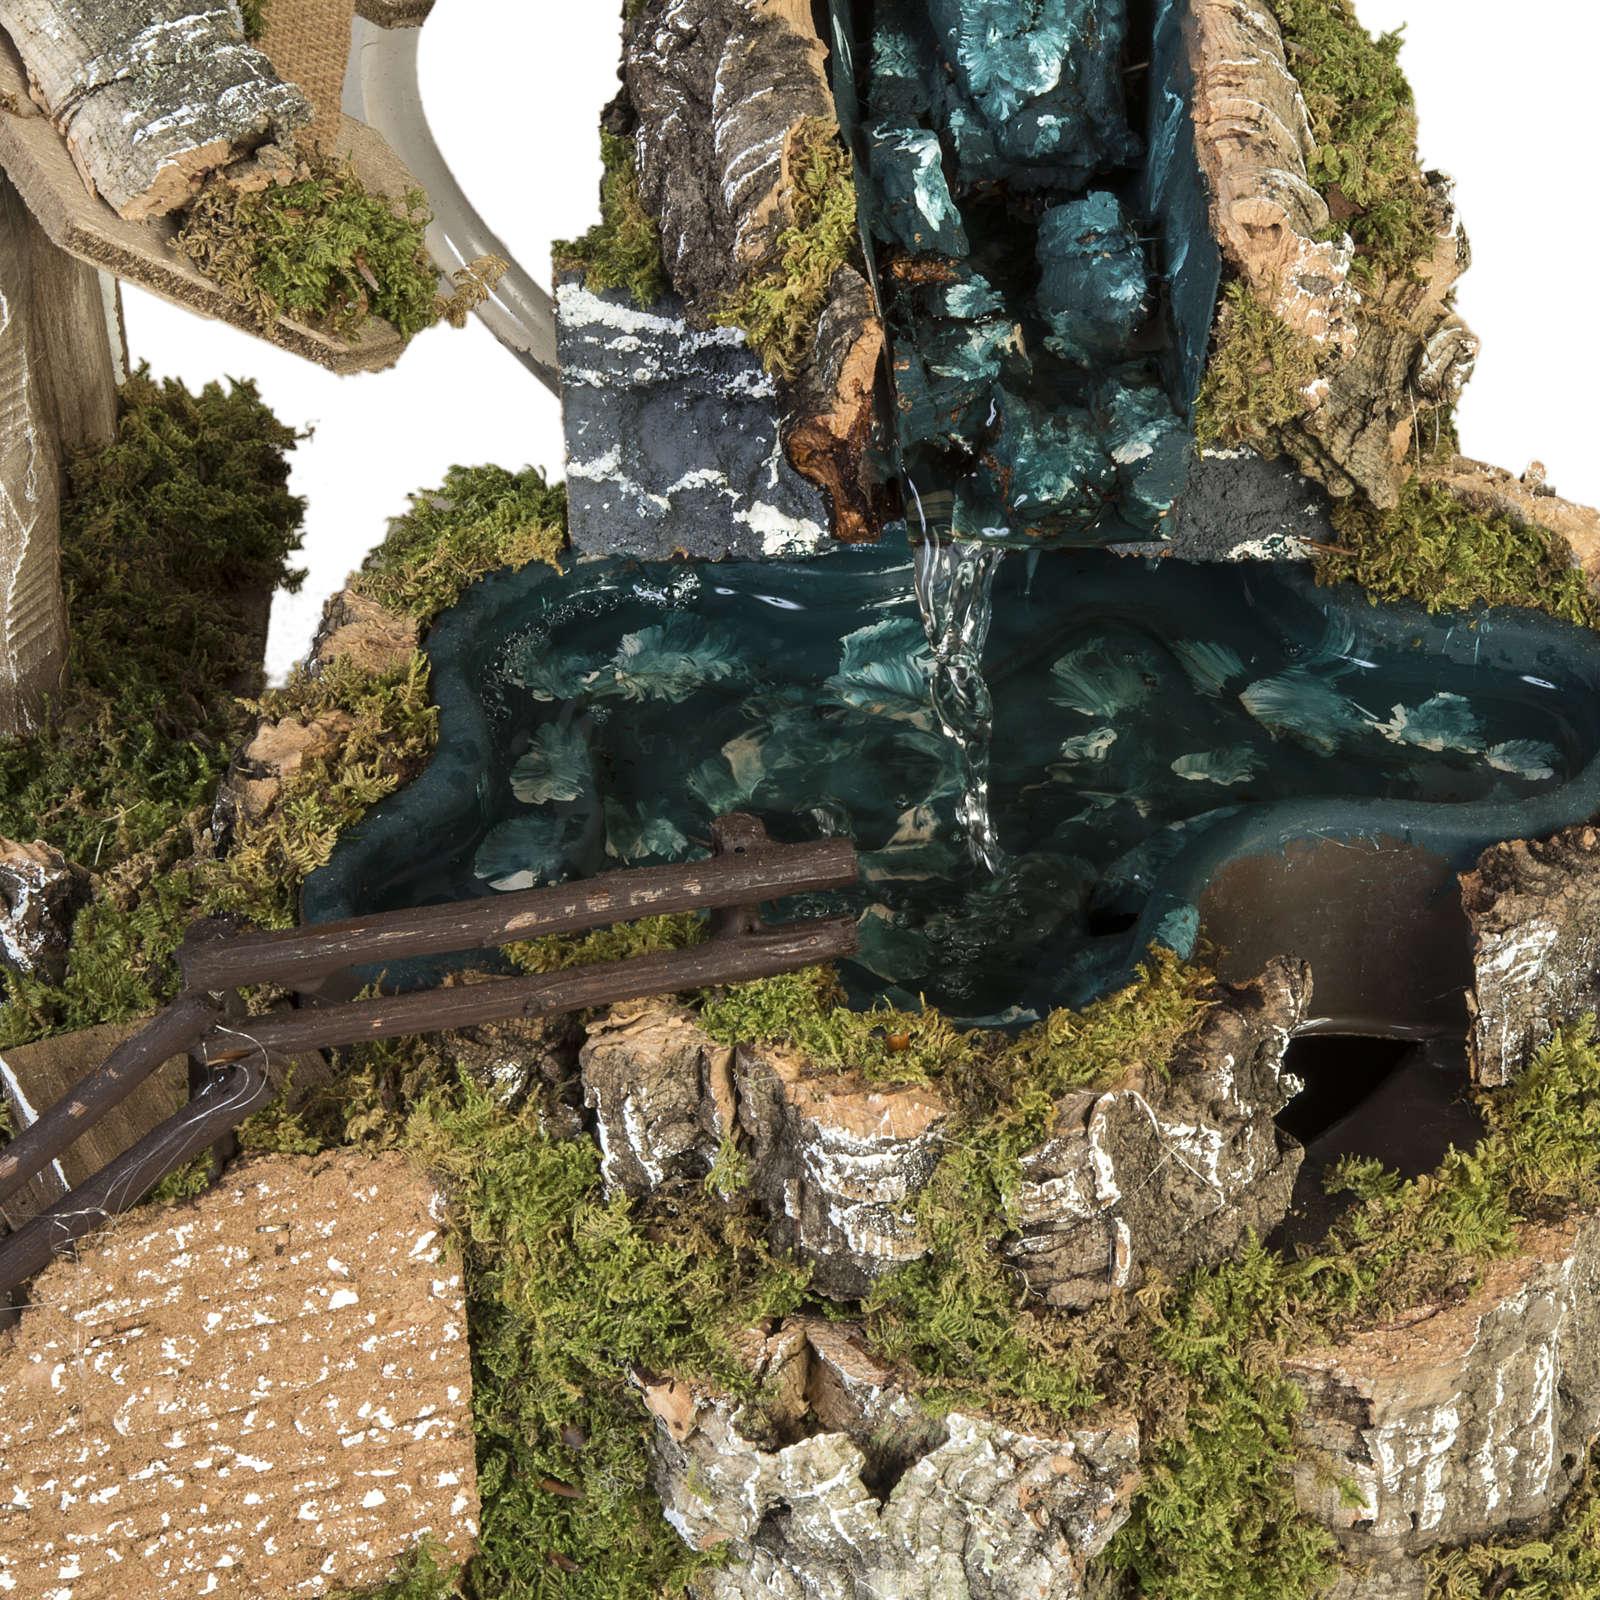 Capanna presepe stile baita con cascata 28x48x24 cm 4